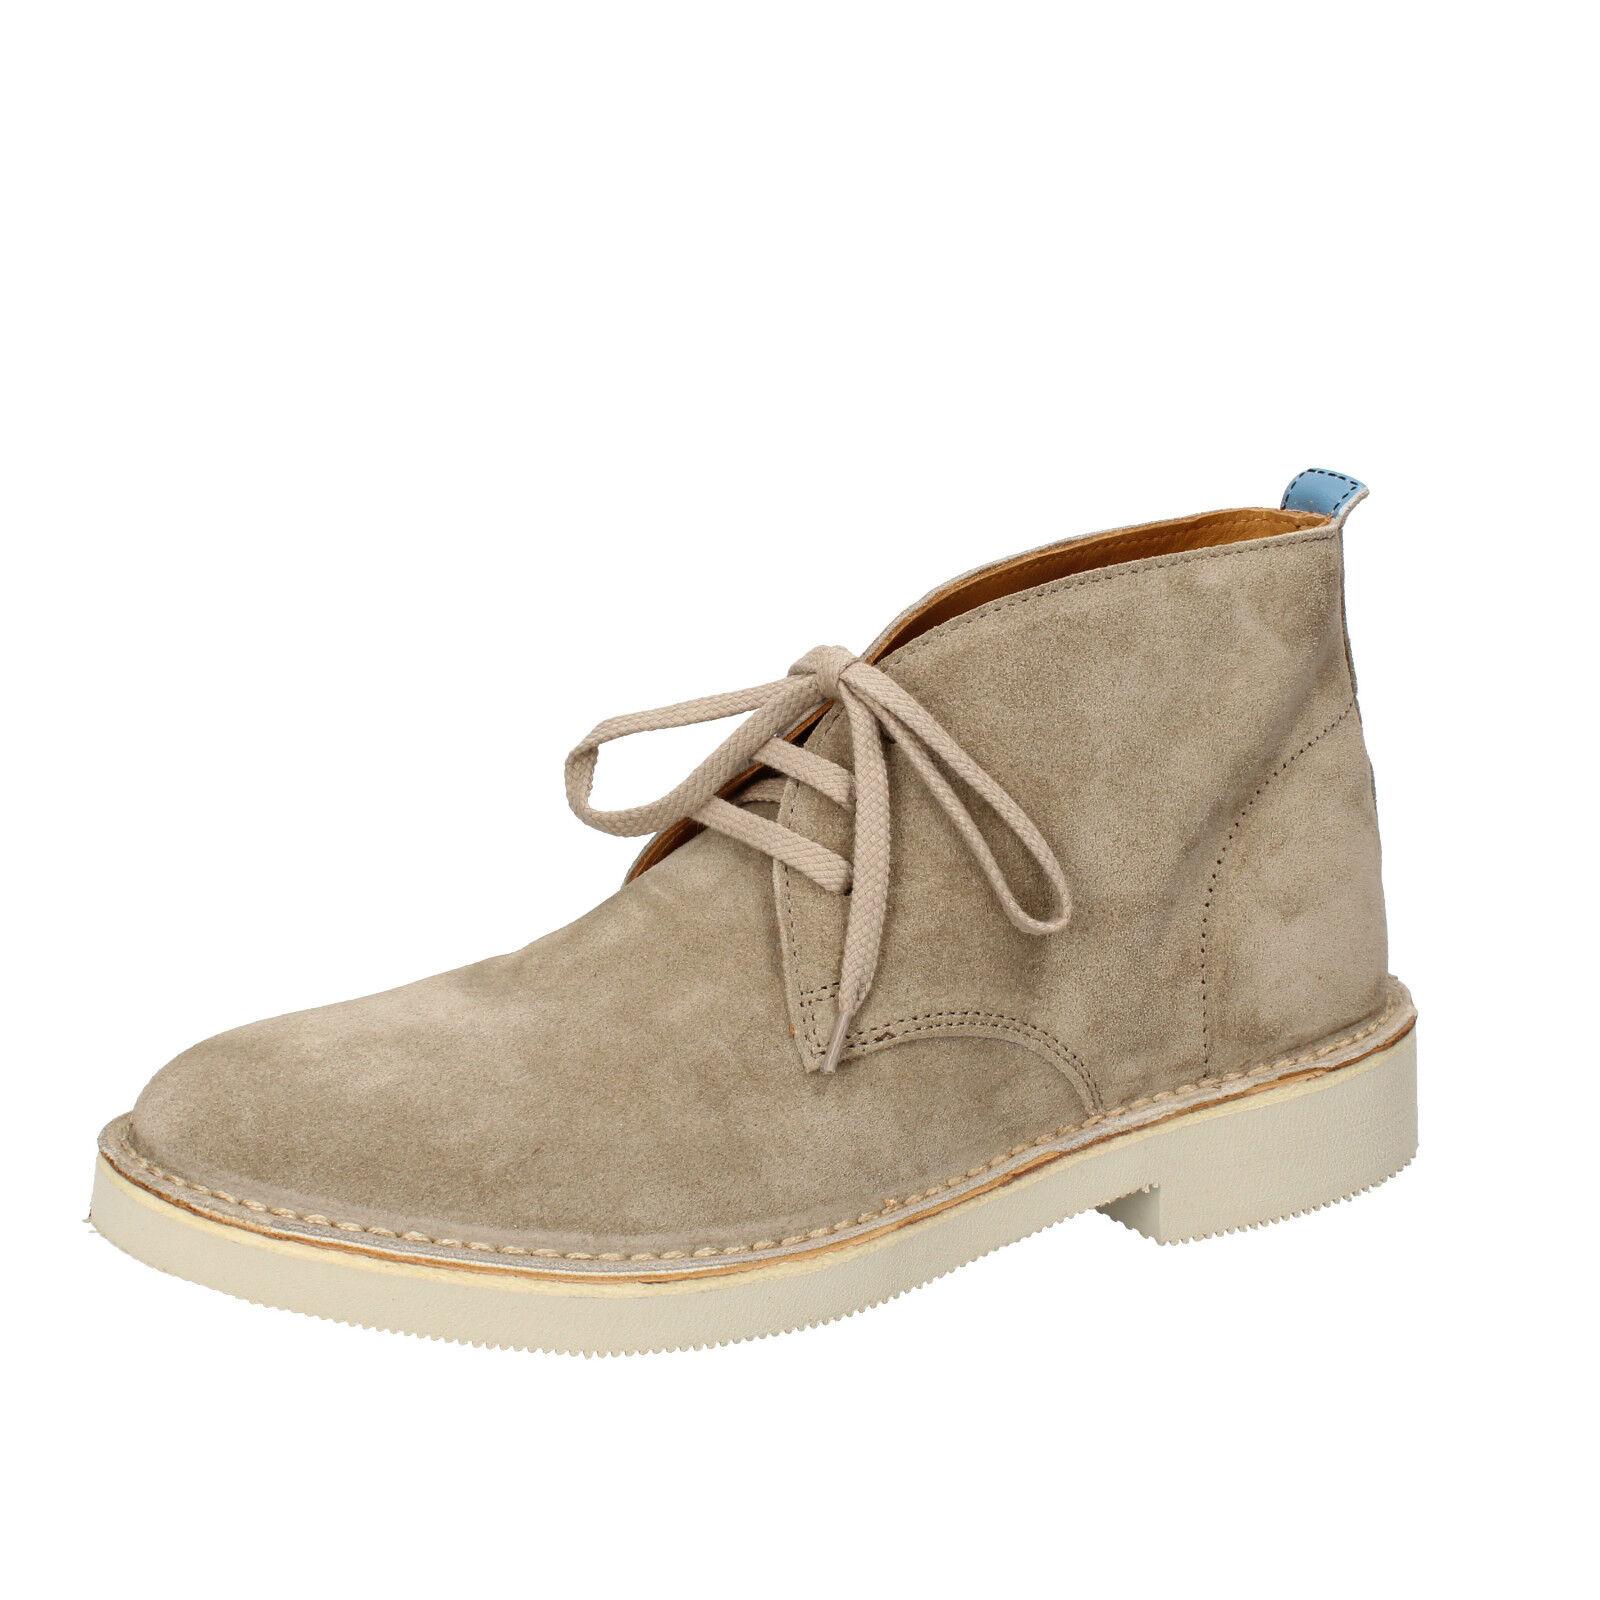 Herren schuhe MOMA 43 EU desert boots beige wildleder AB326-F